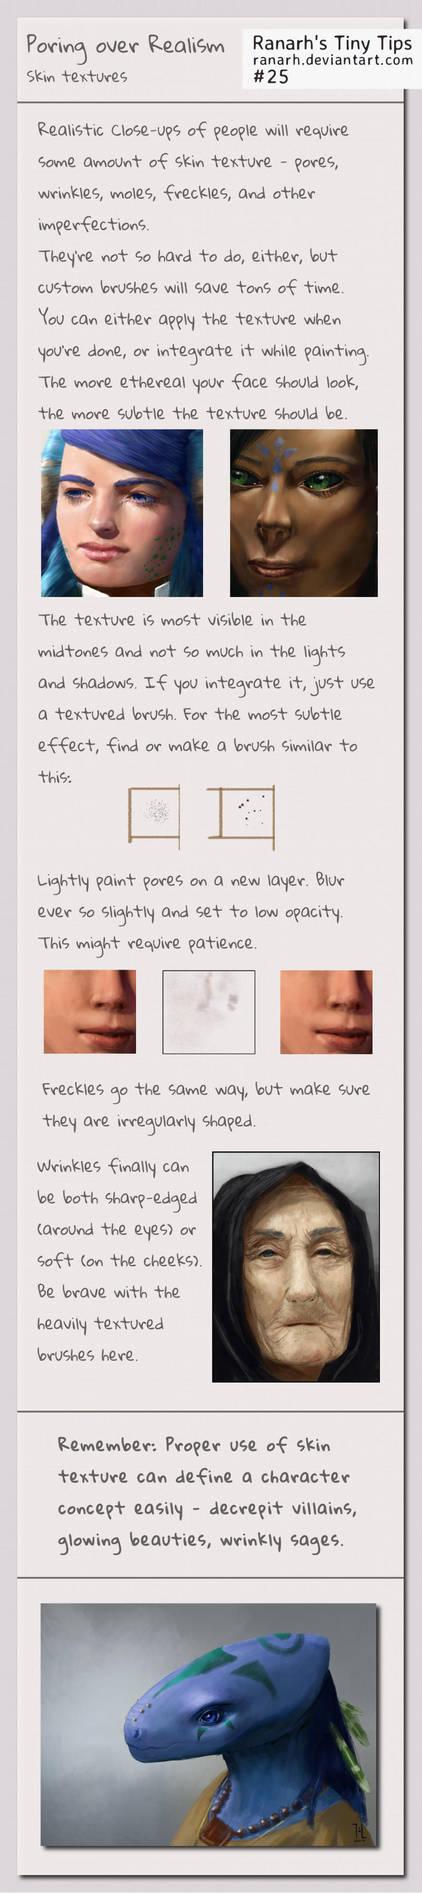 Tiny Tips: Poring over realism by Ranarh